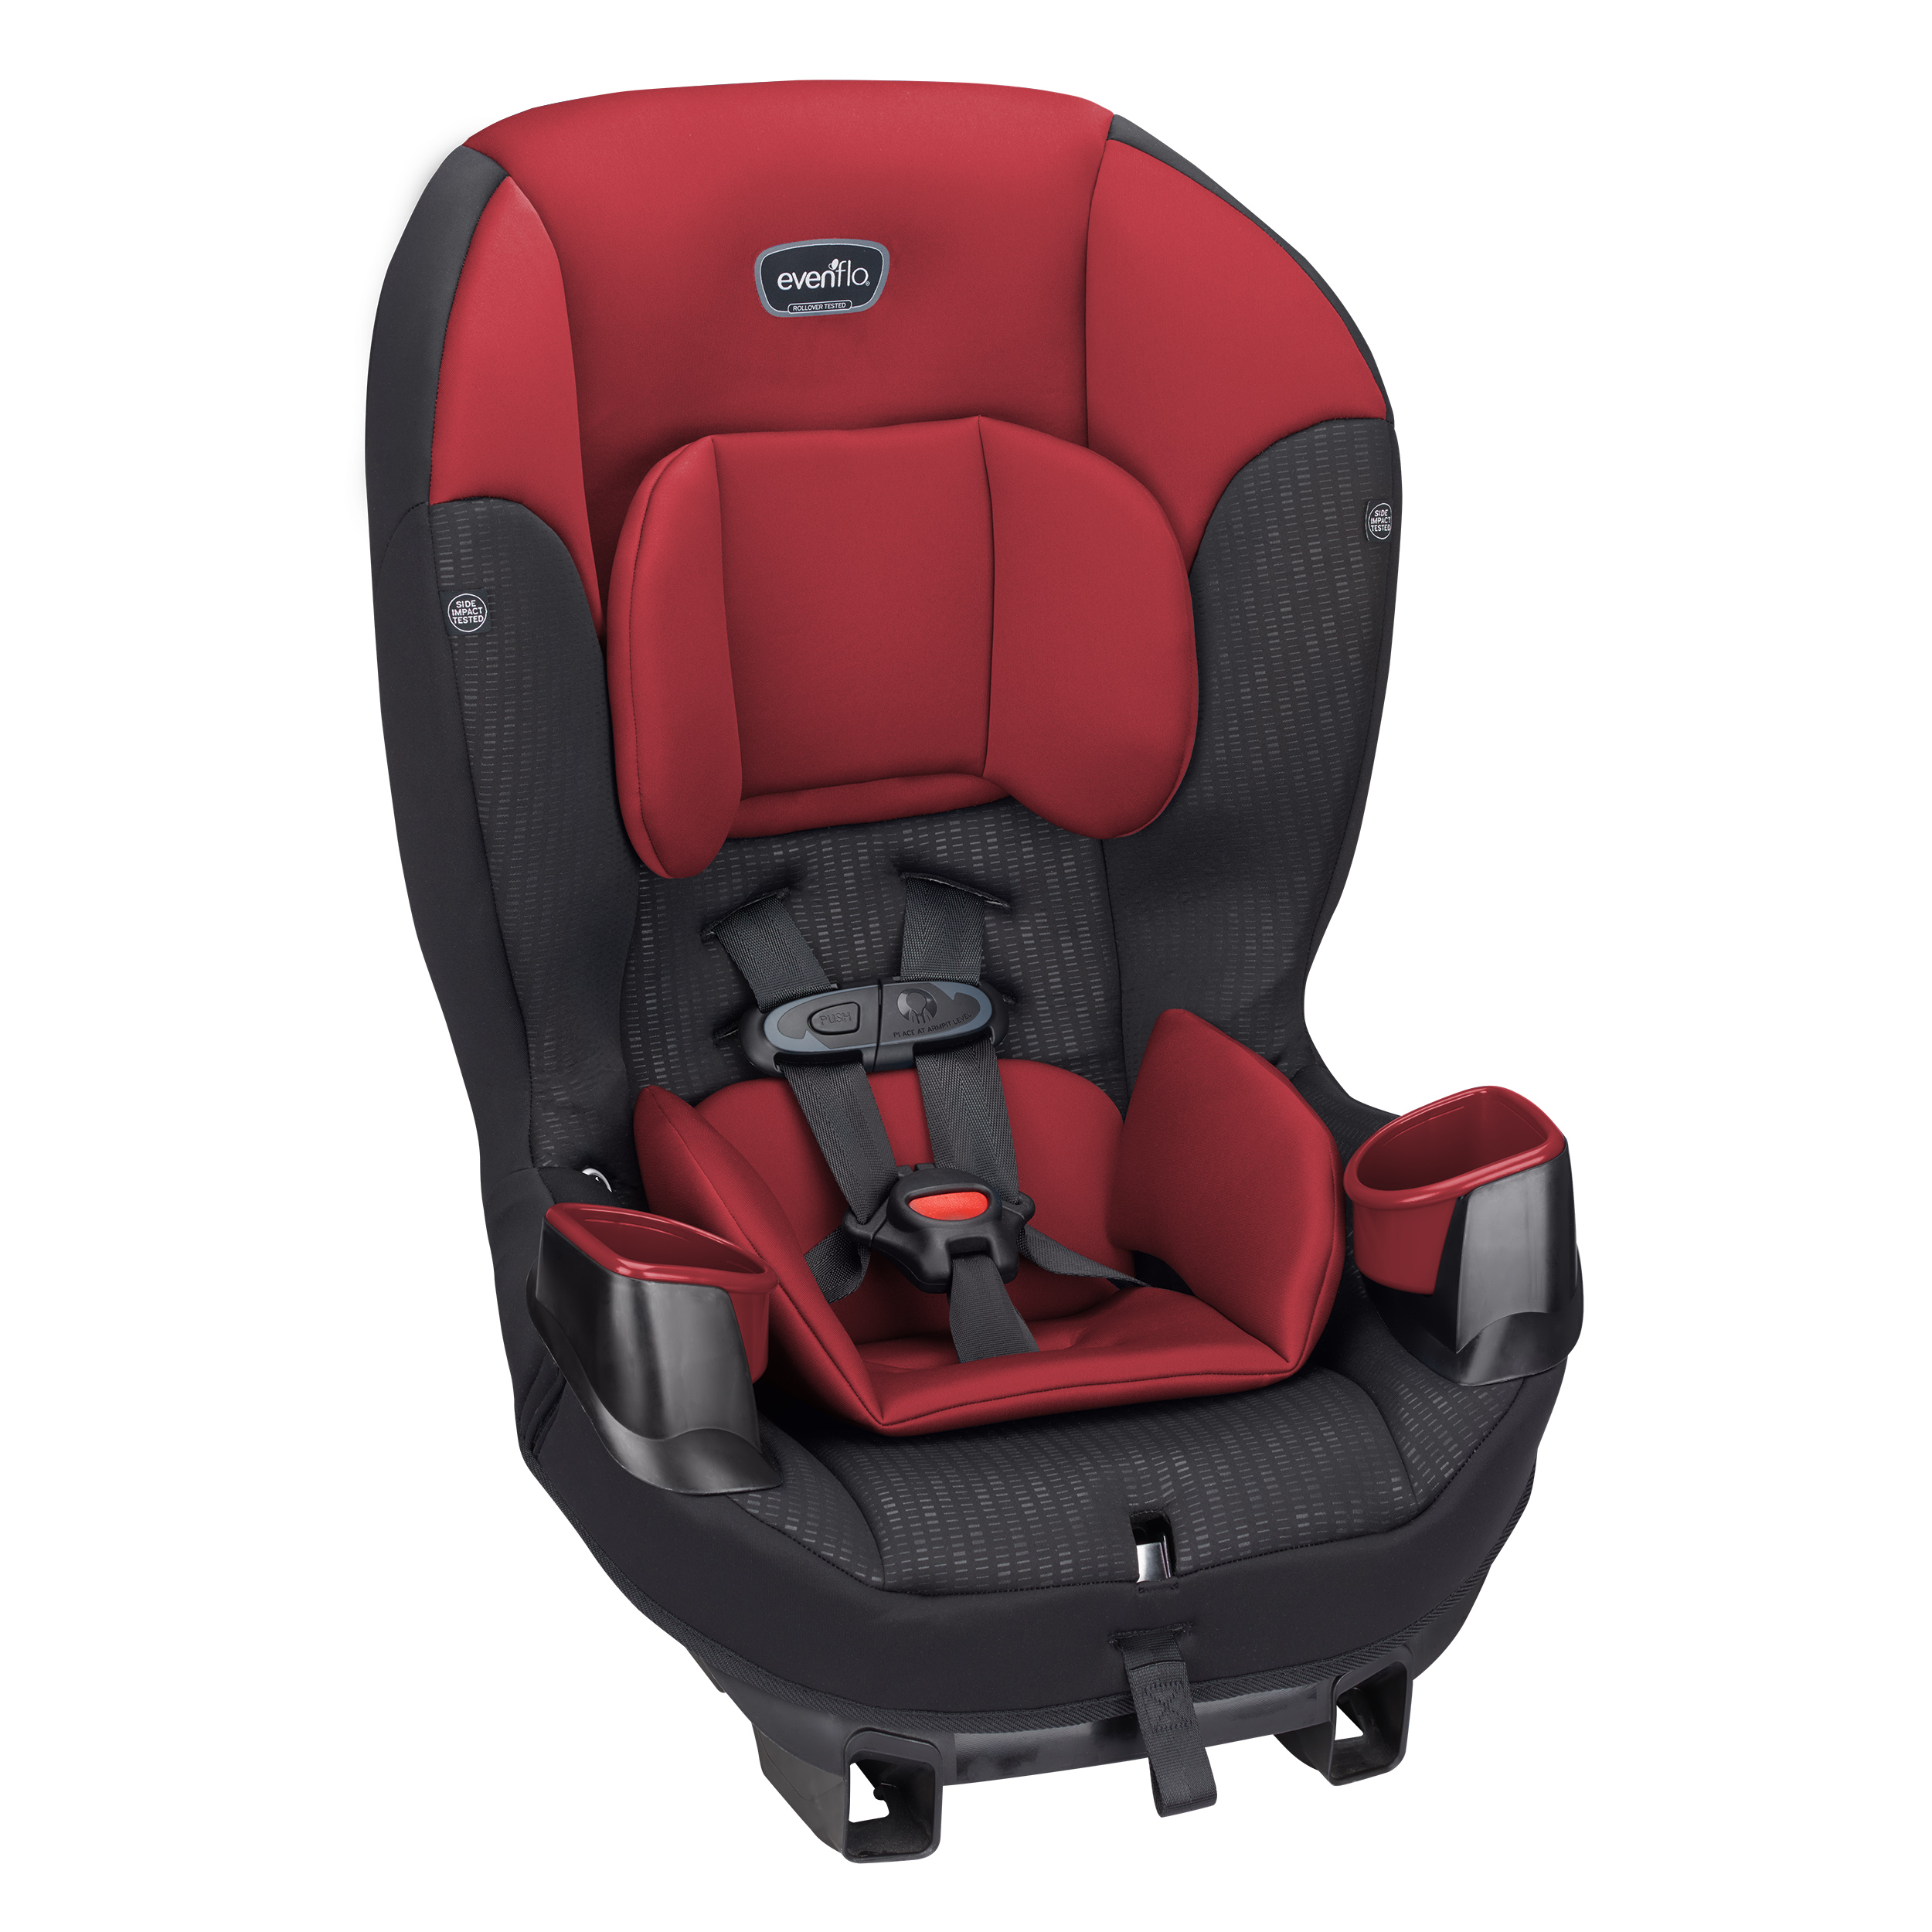 Evenflo Sonus65 Convertible Car Seat, choose your color